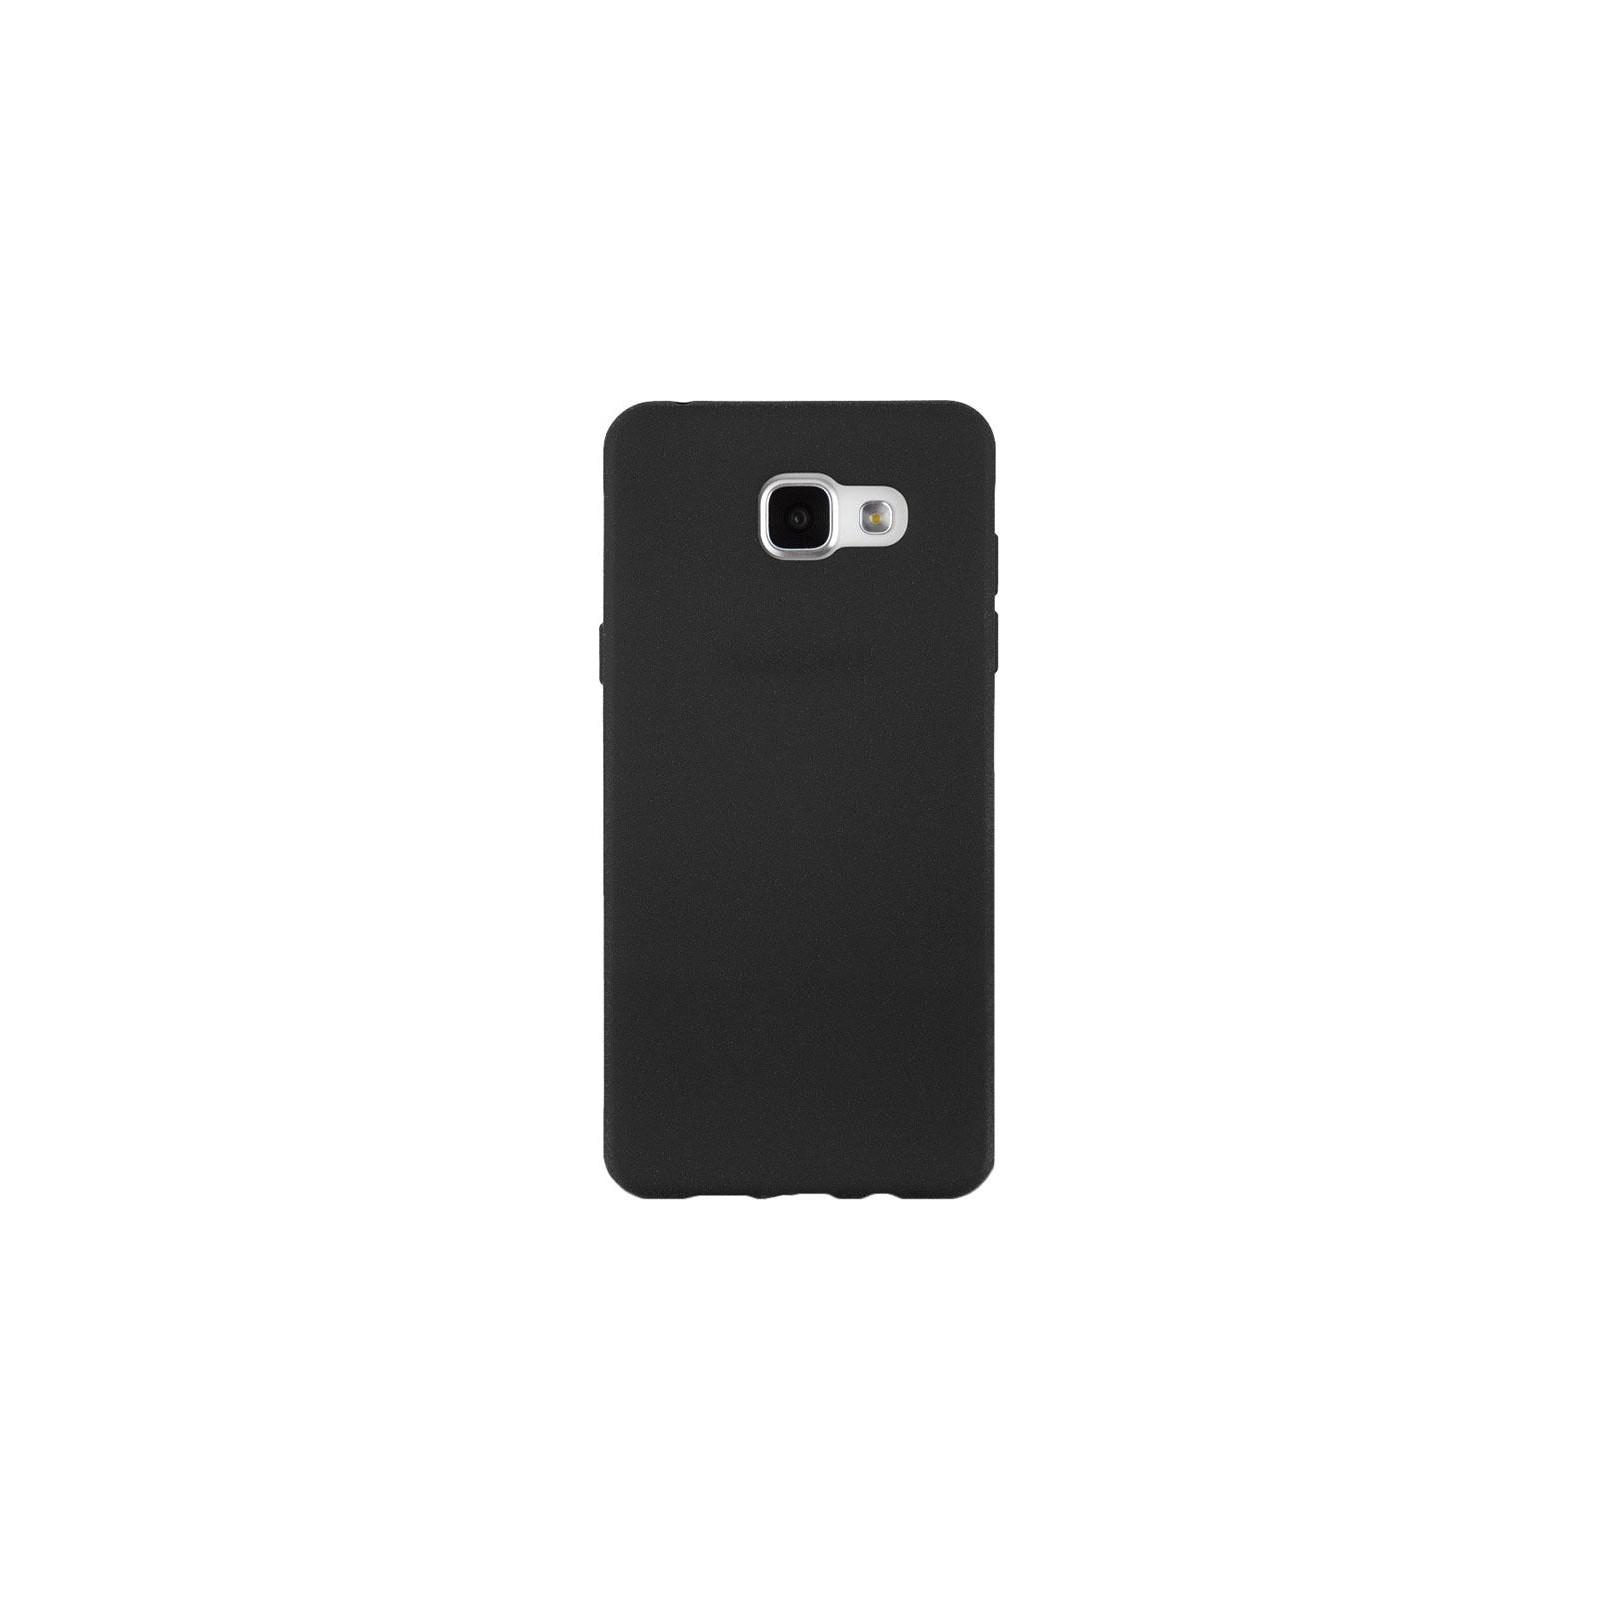 Чехол для моб. телефона Honor для Samsung A710 (A7-2016) Umatt Series Black (44744)